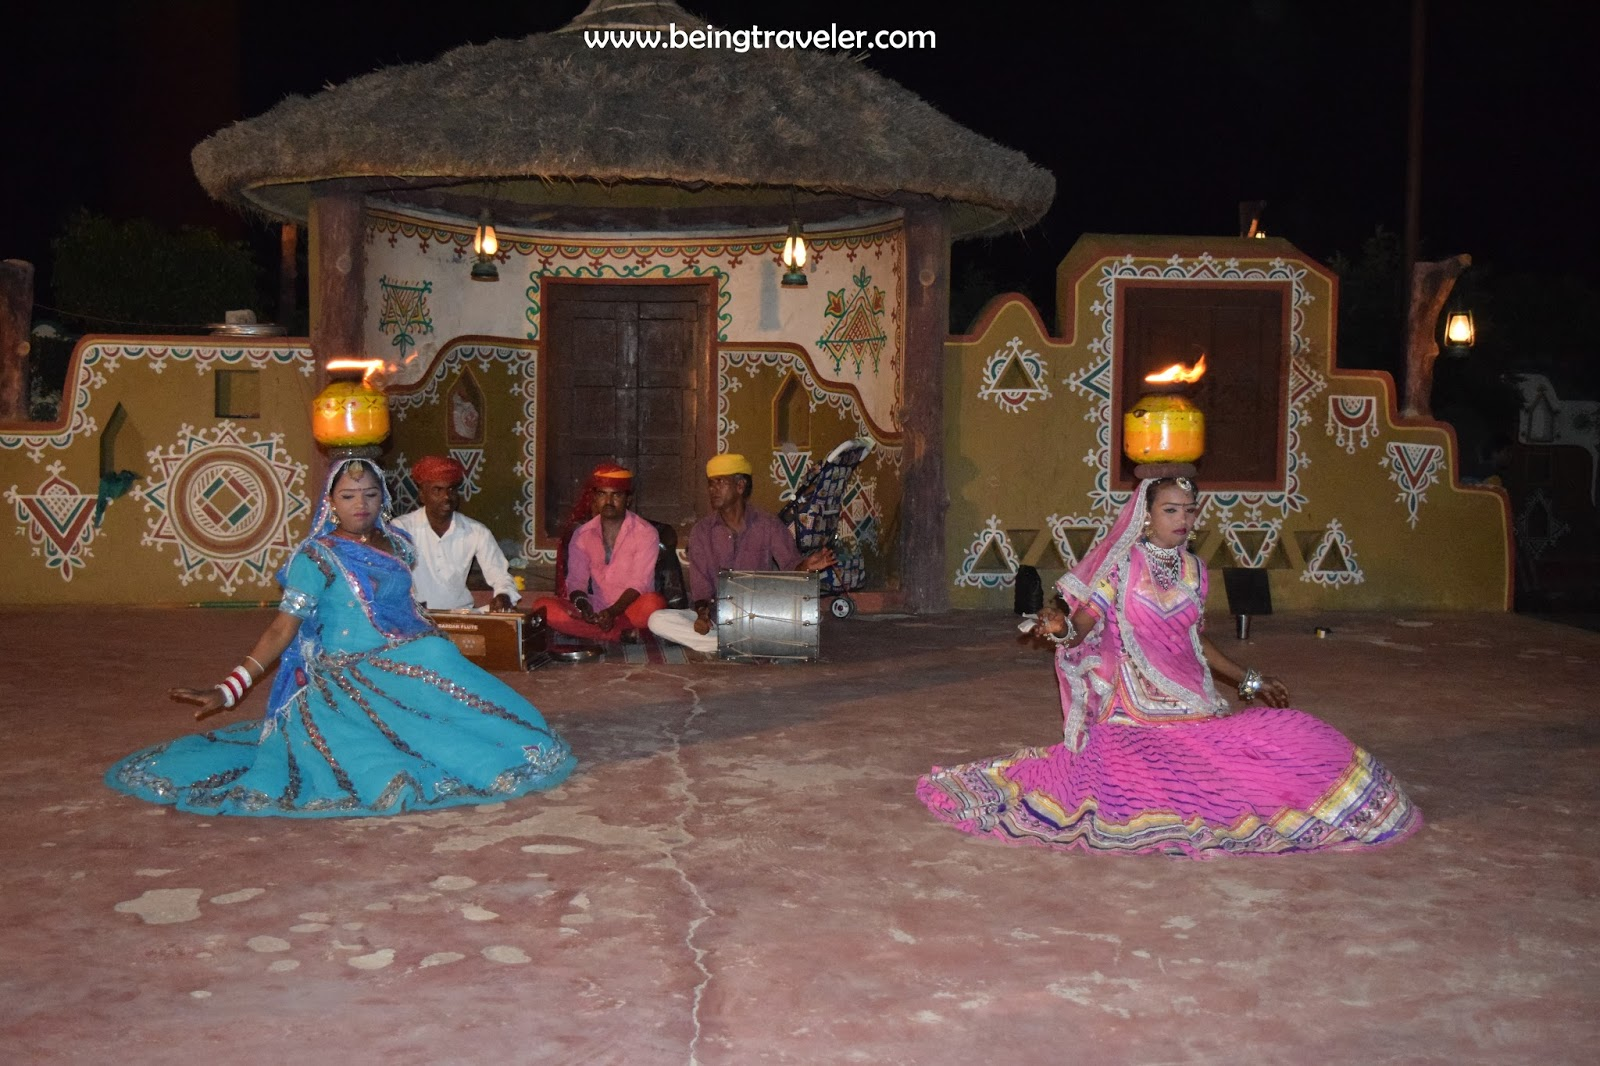 Chokhi Dhani, Sonipat, Haryana | Being Traveler